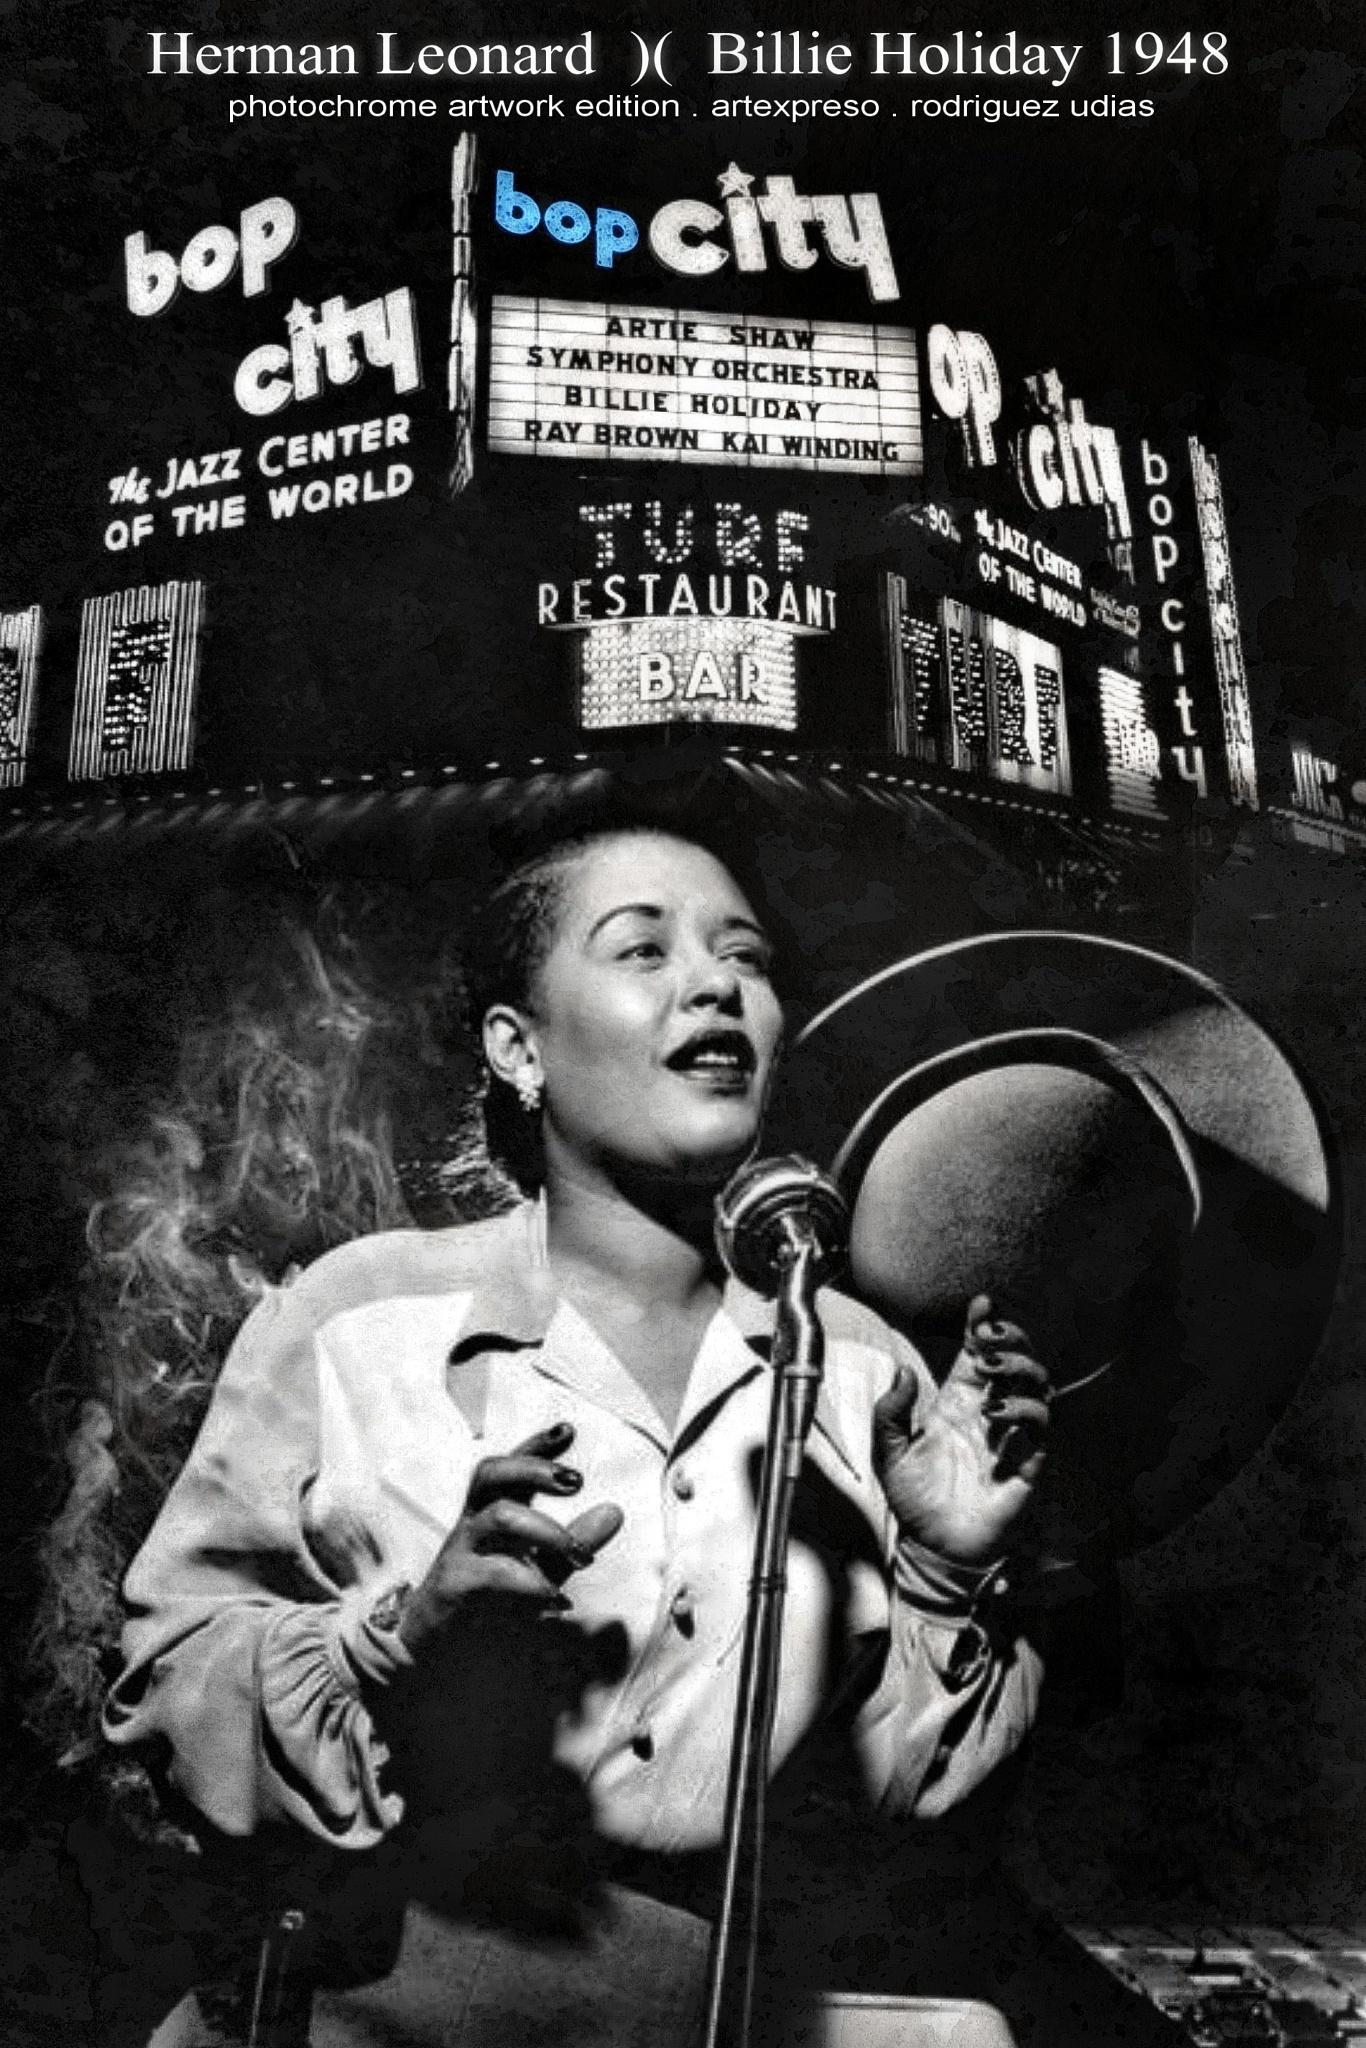 HERMAN LEONARD . BILLIE HOLIDAY 1948 / Photochrome ArtWork Edition / Artexpreso 2016 .. by  Artexpreso